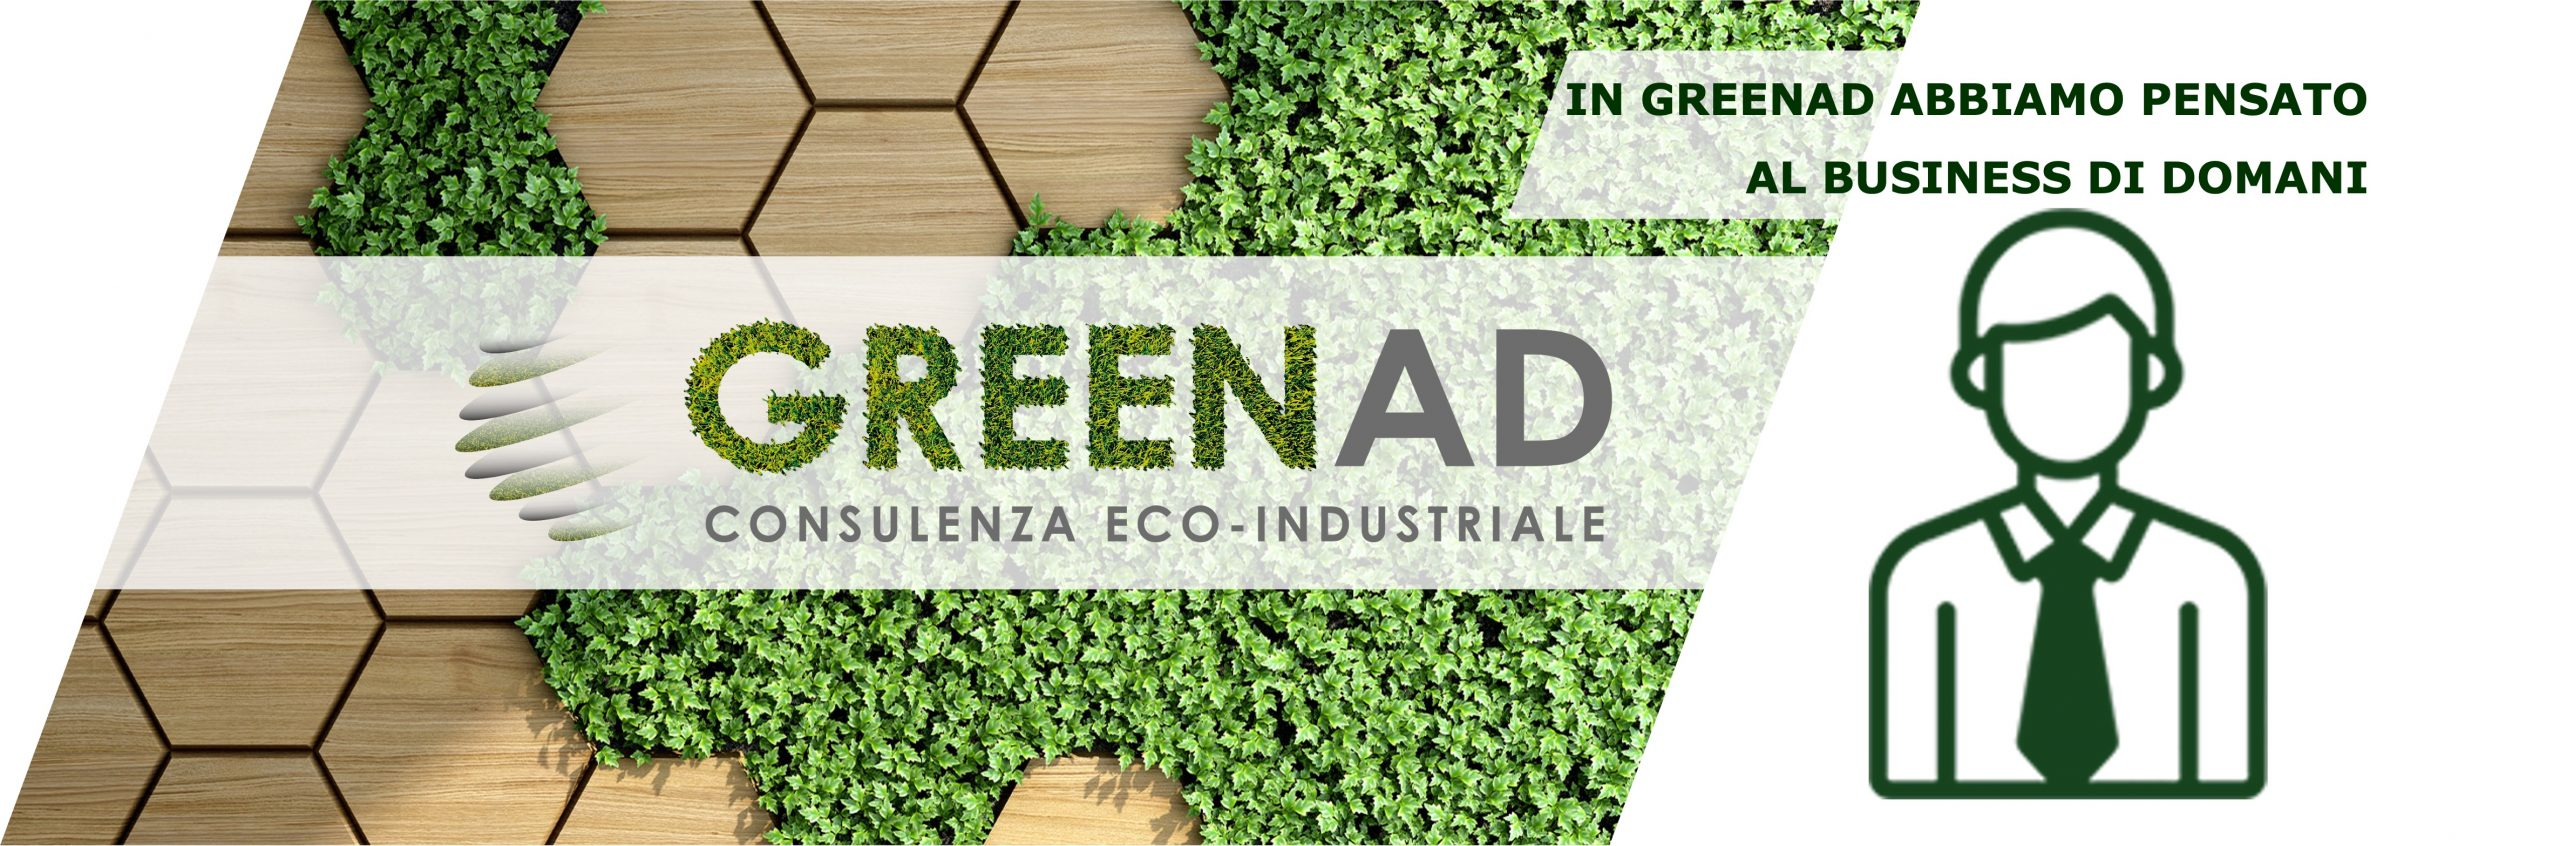 Mvconsulting Presenta Greenad 2